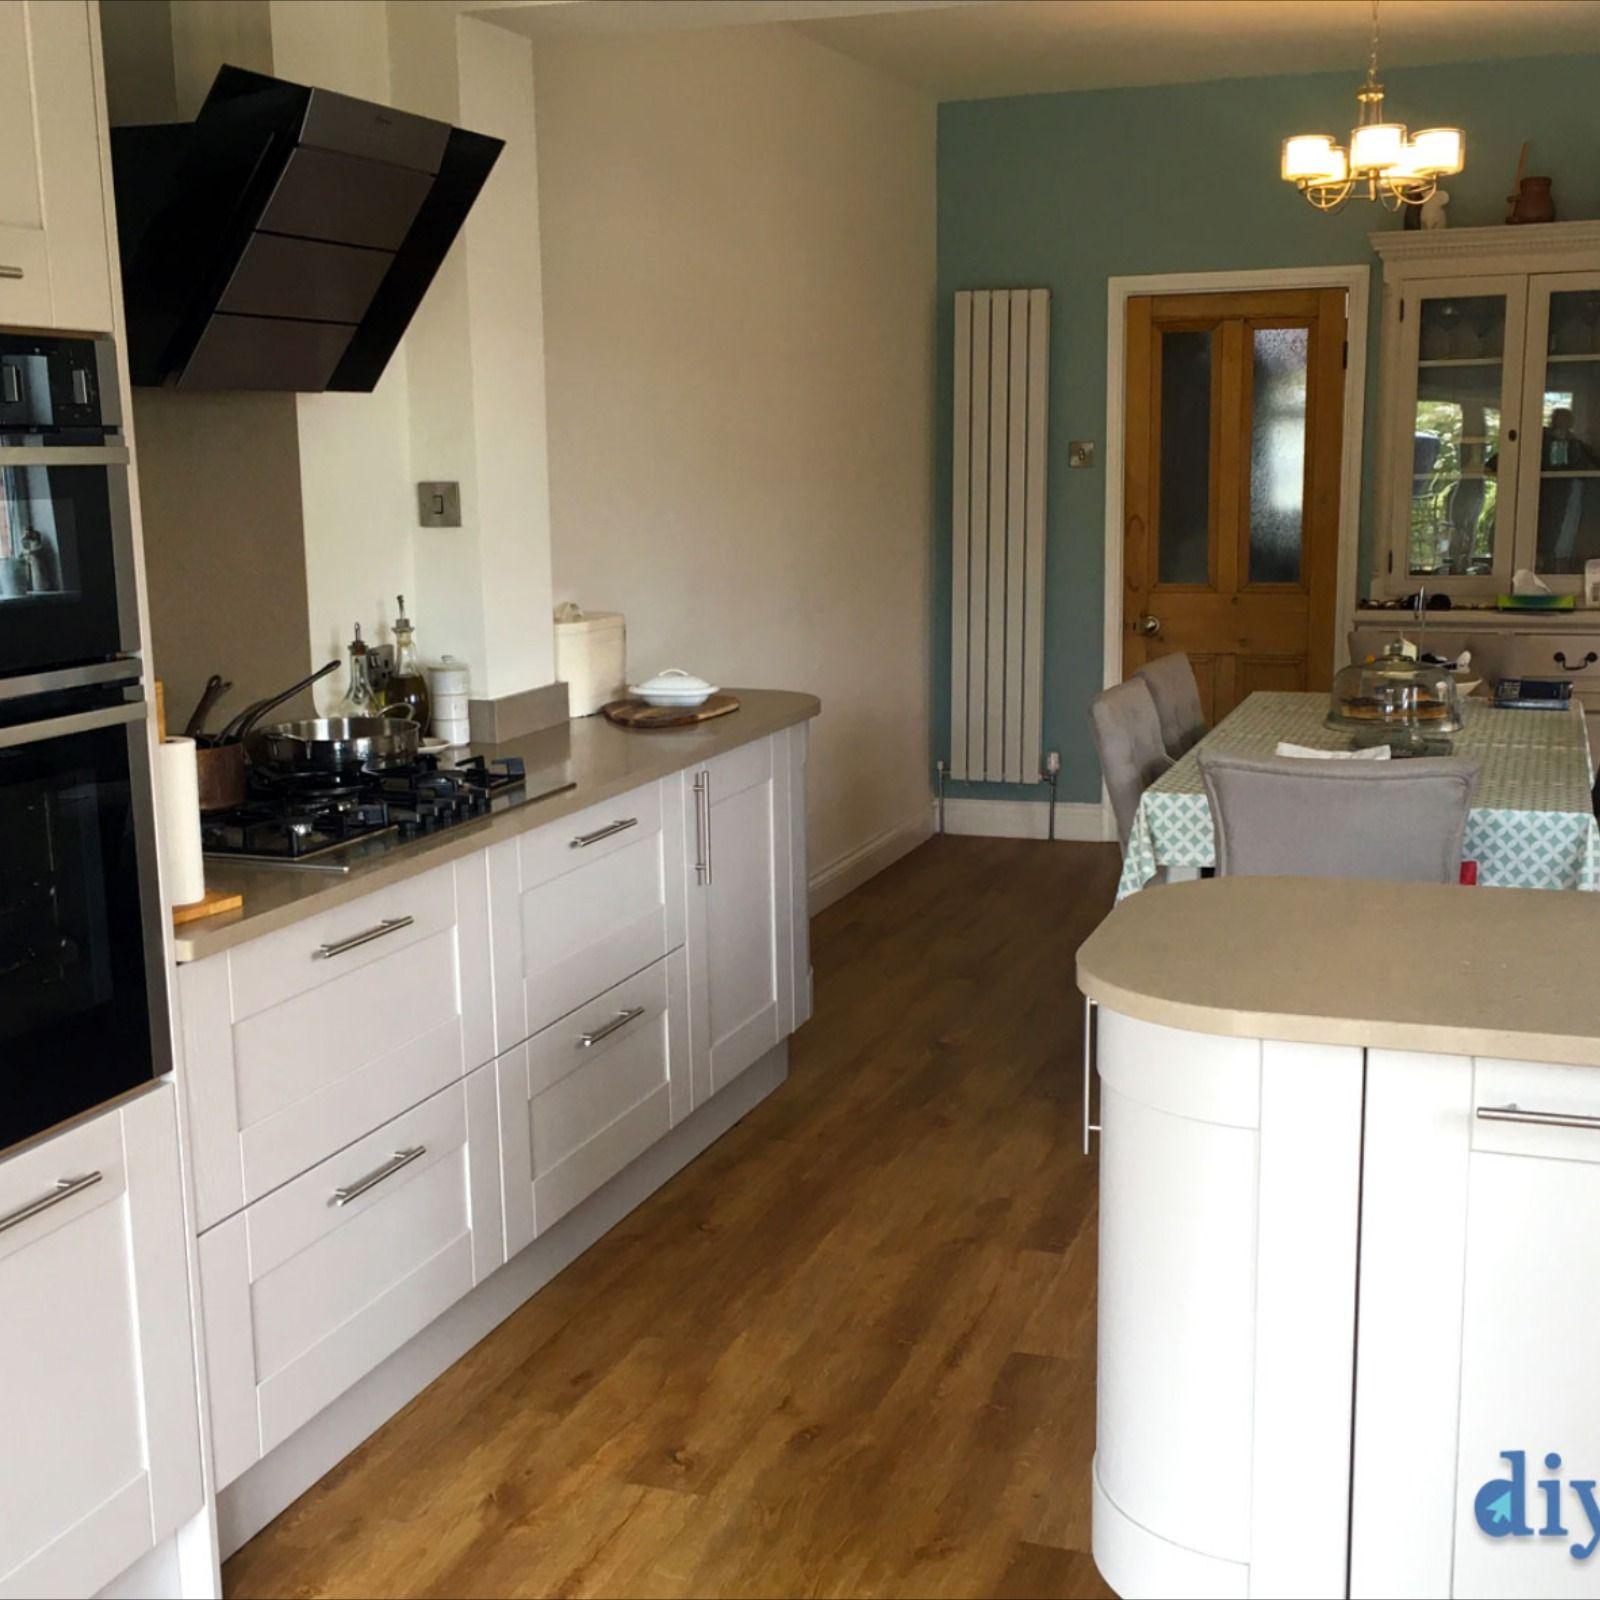 Linwood Cashmere in 2020 Cashmere shaker kitchen, Shaker